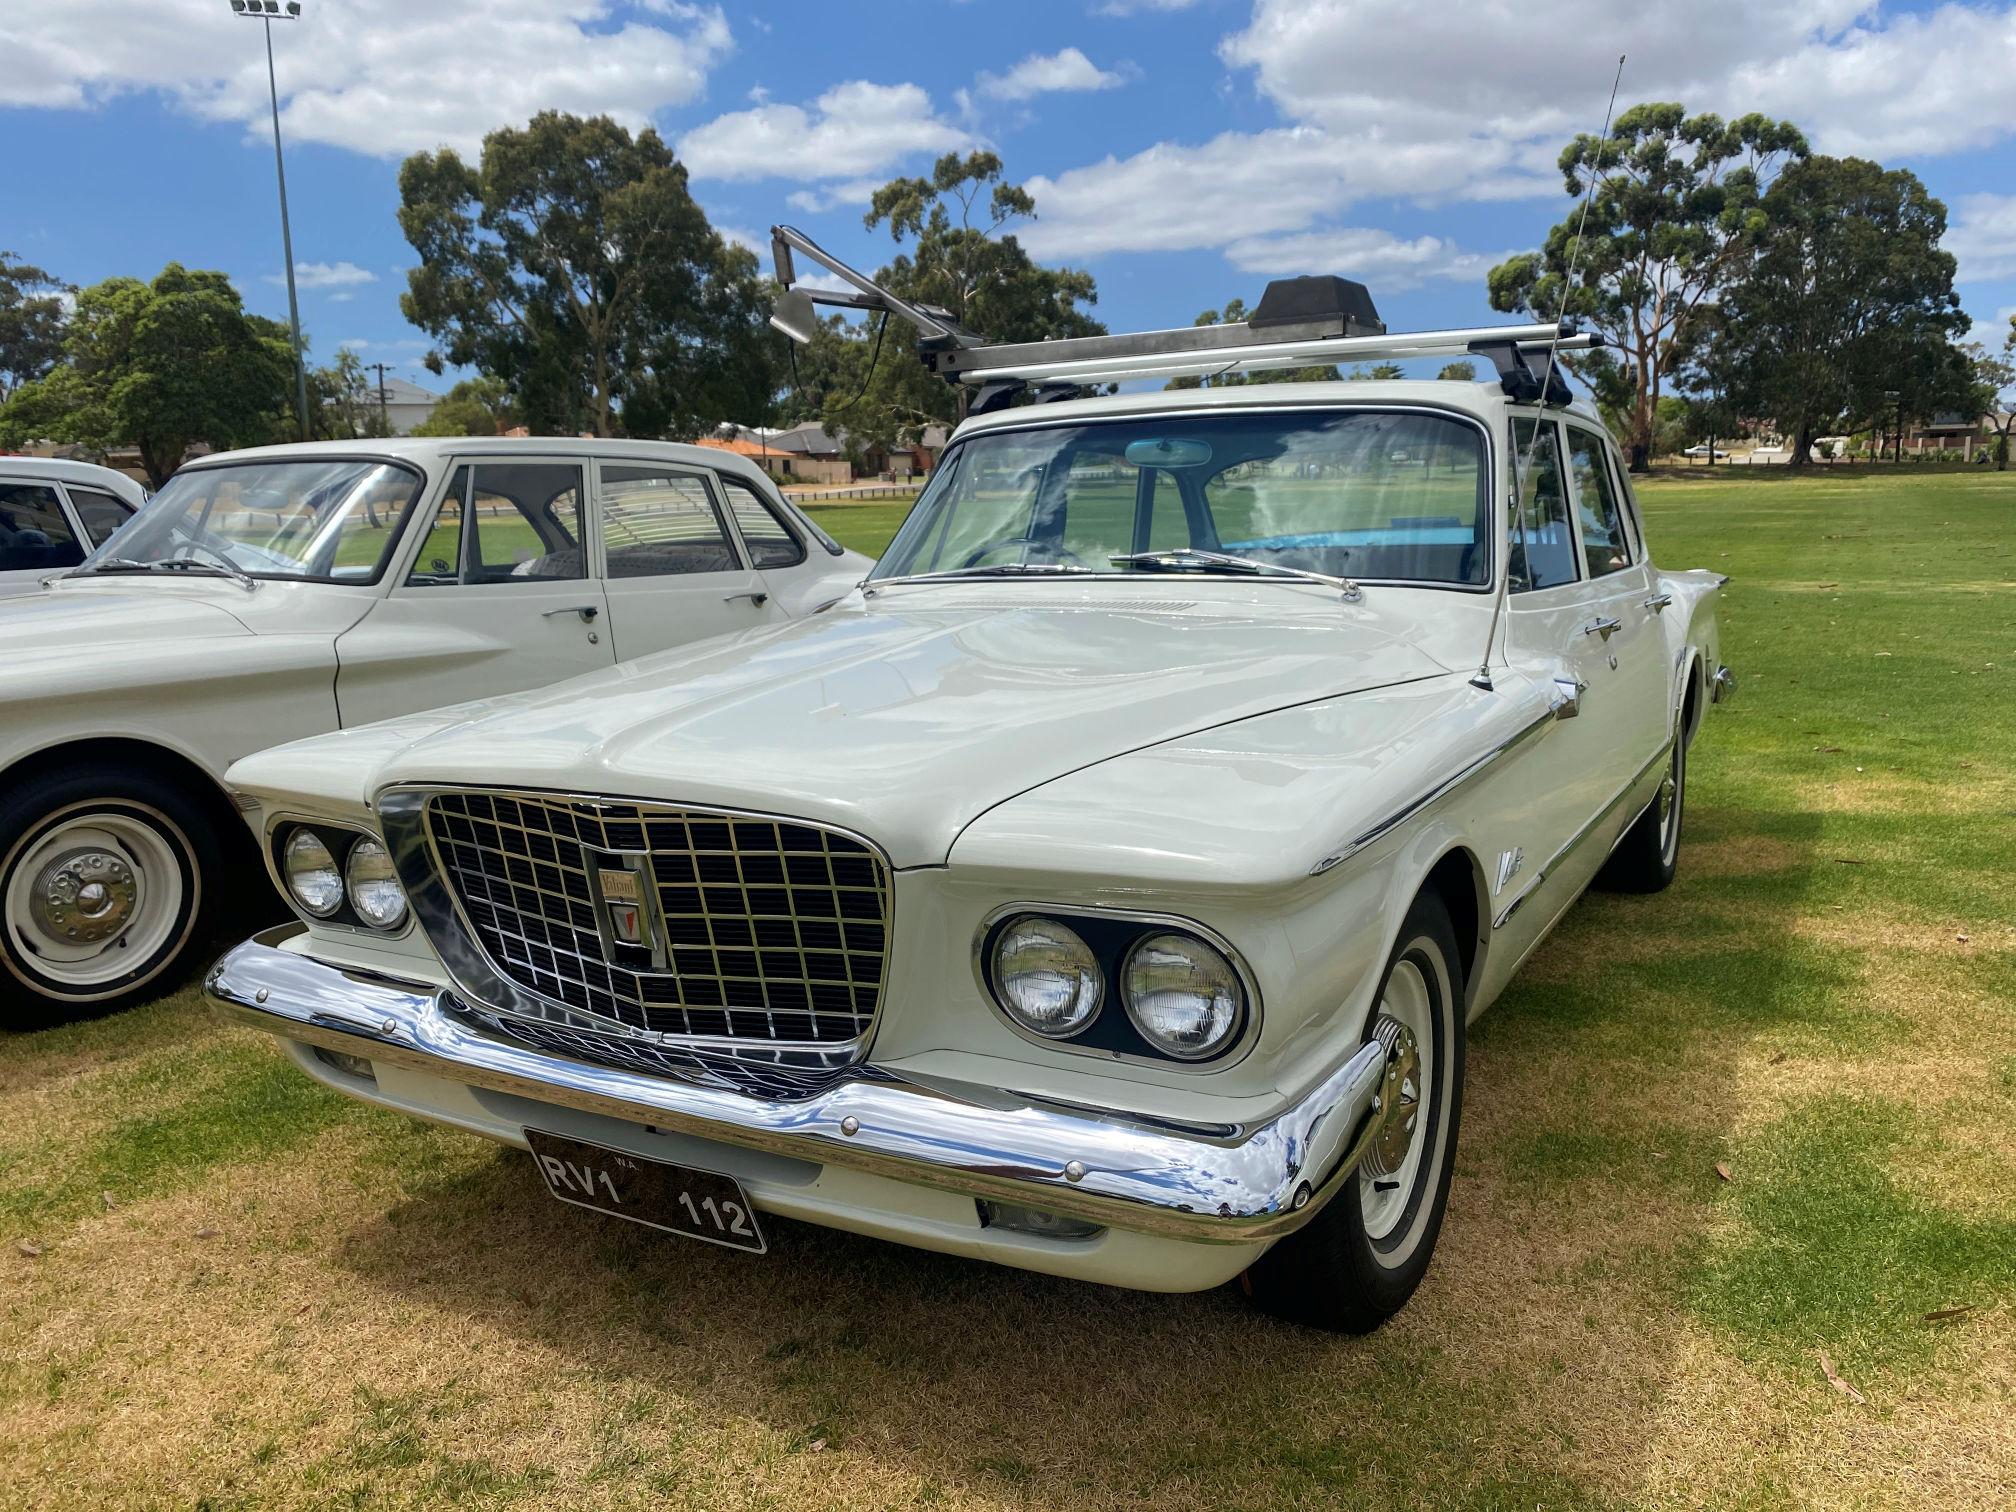 John Mitchell's Car